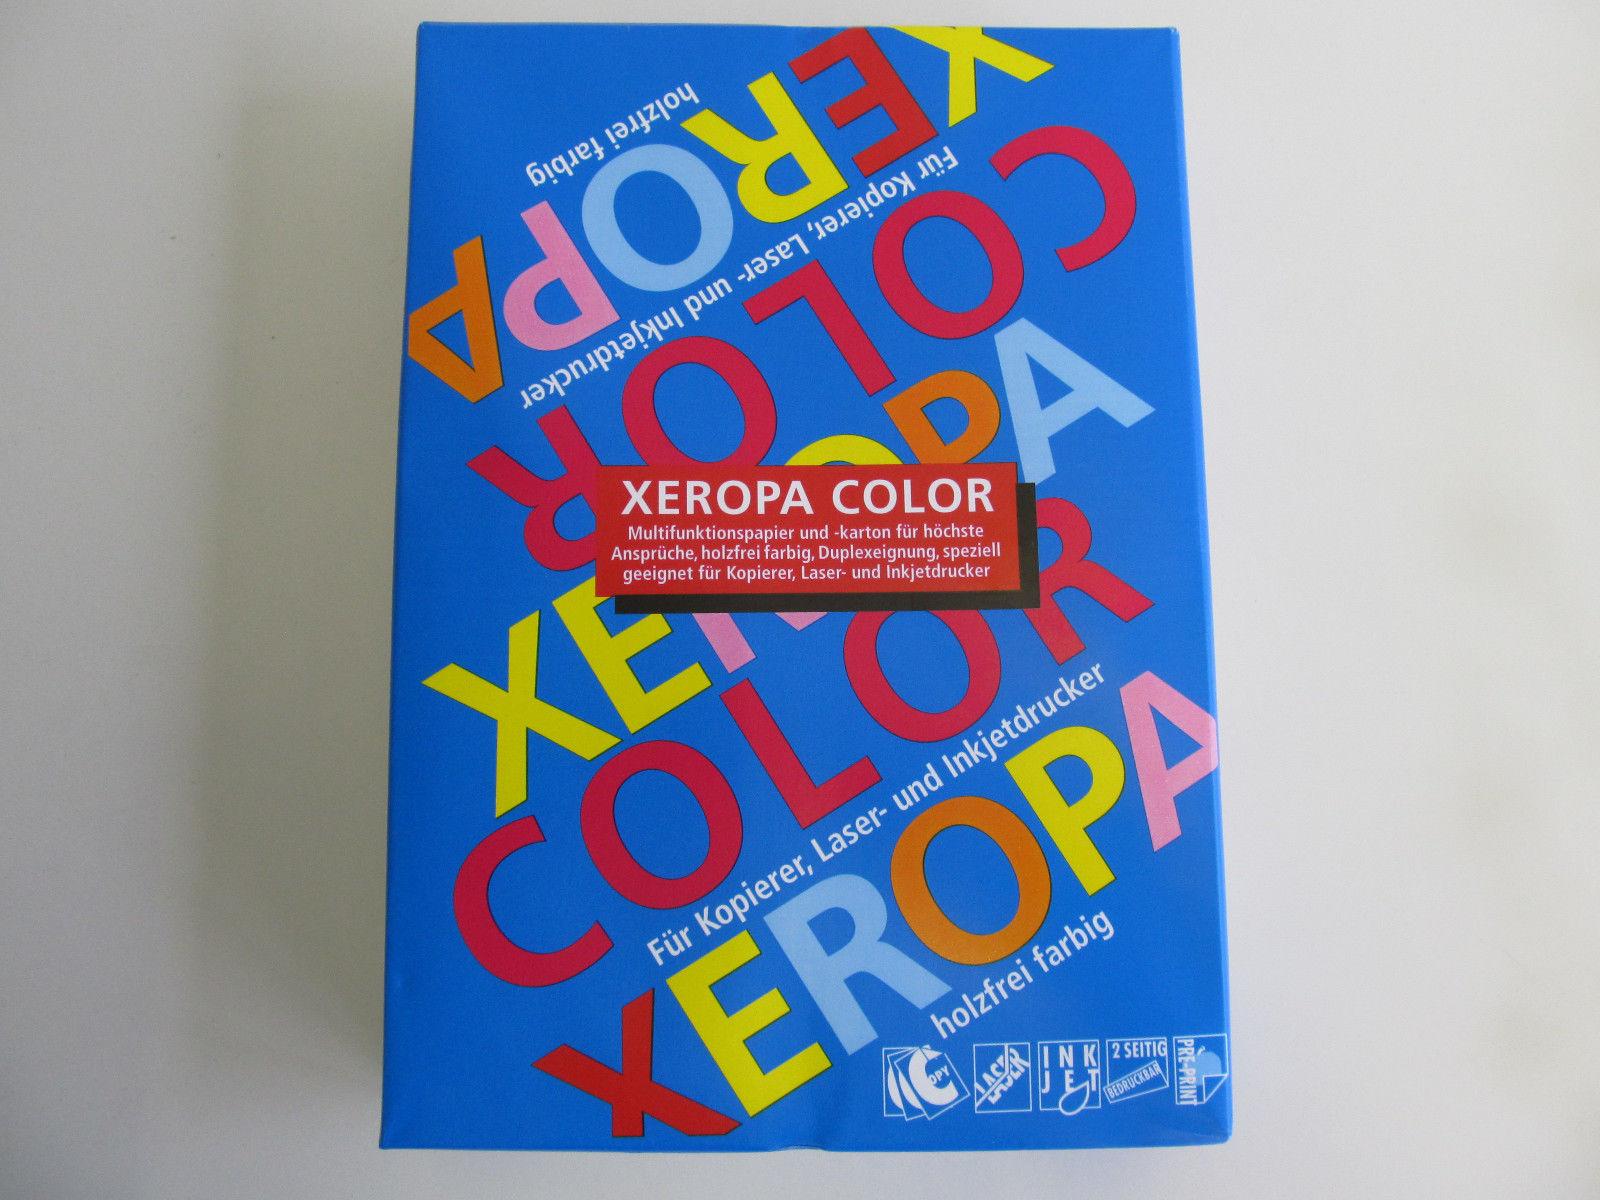 XEROPA Multifunktionspapier holzfrei 160g/m² DIN-A4 weiß - 250 bis 1250 Blatt -